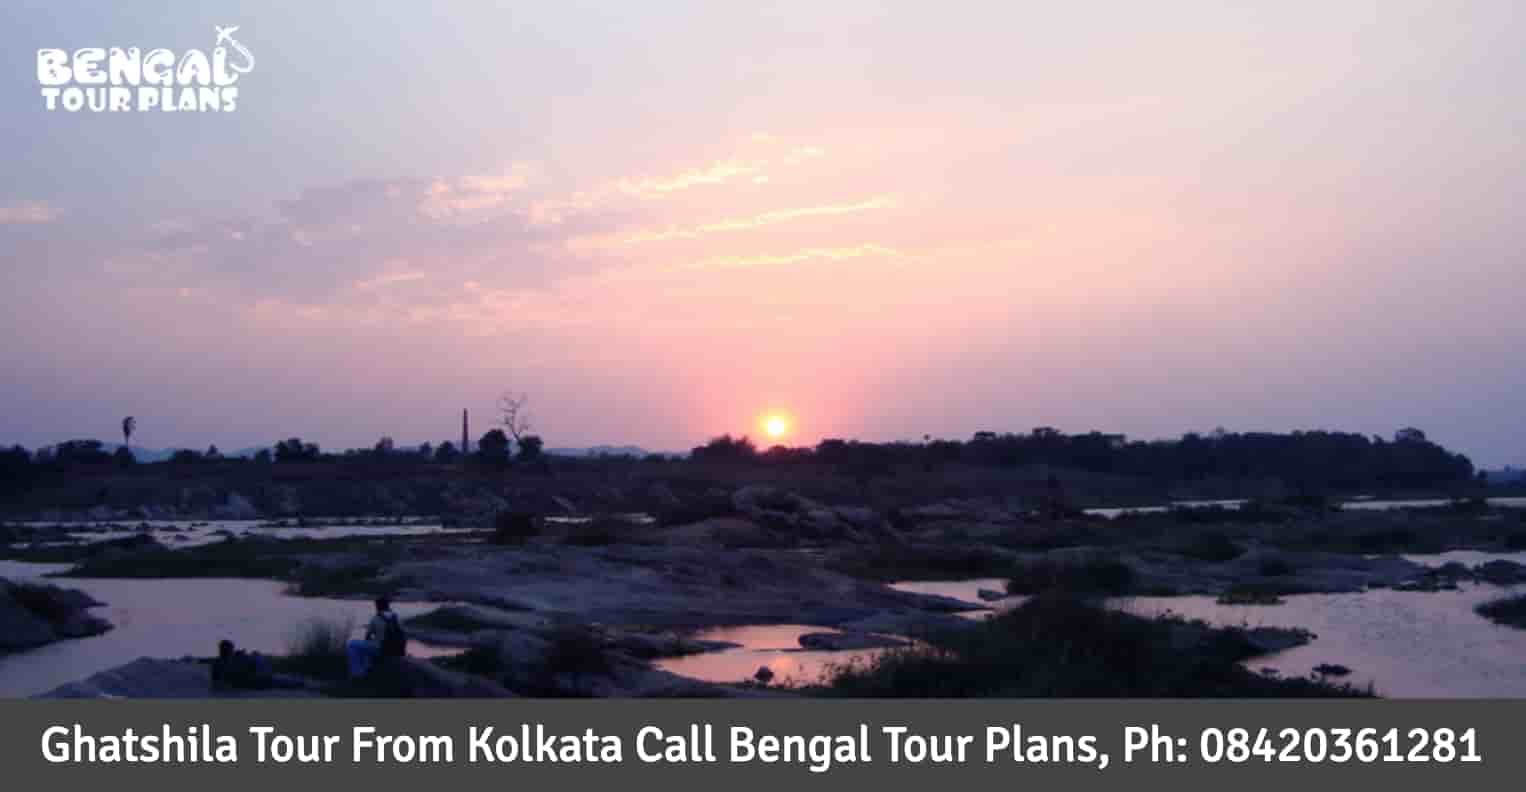 Ghatshila Tour Package From Kolkata